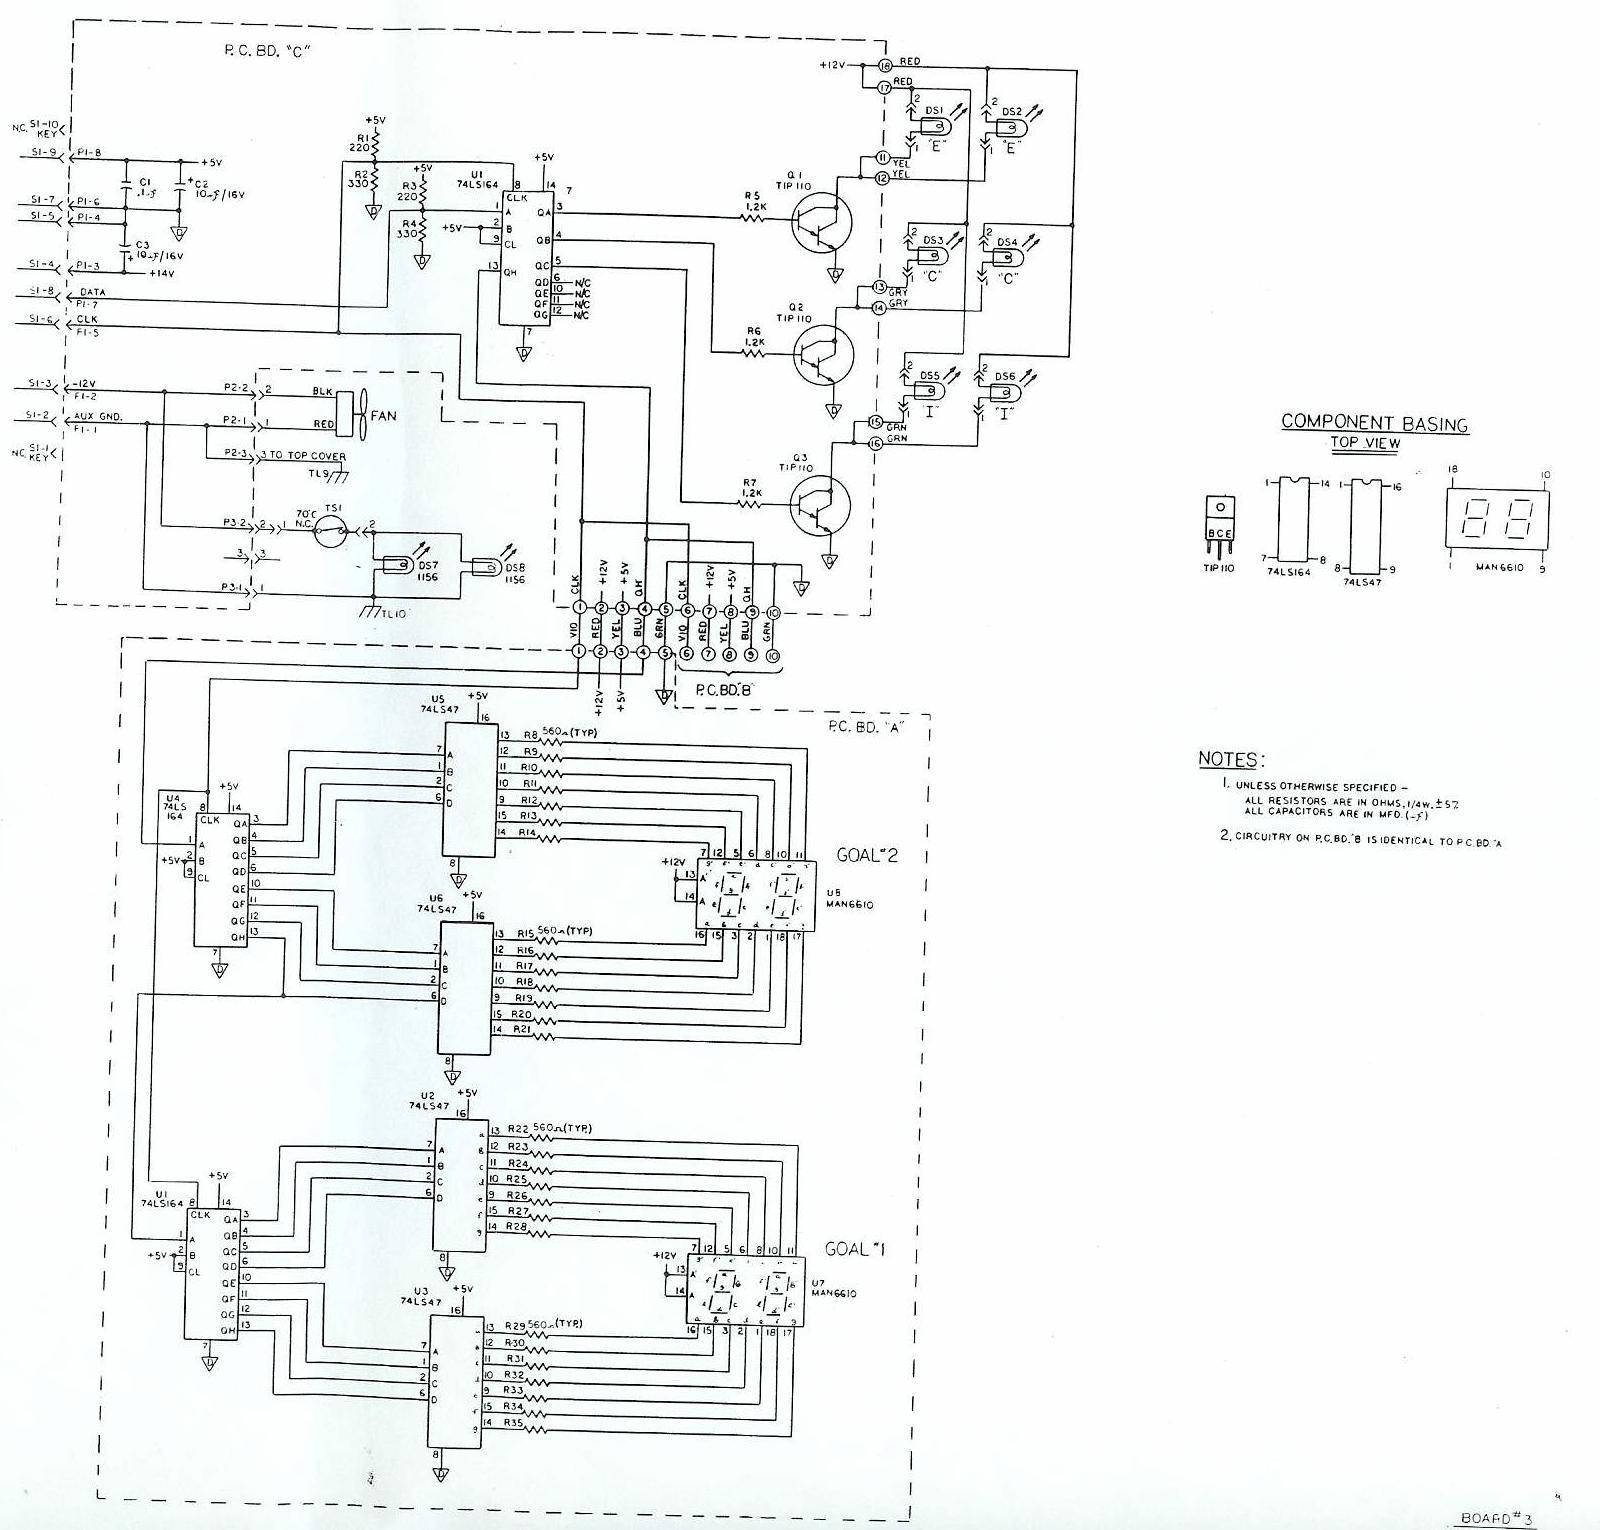 scoreboard wiring diagrams